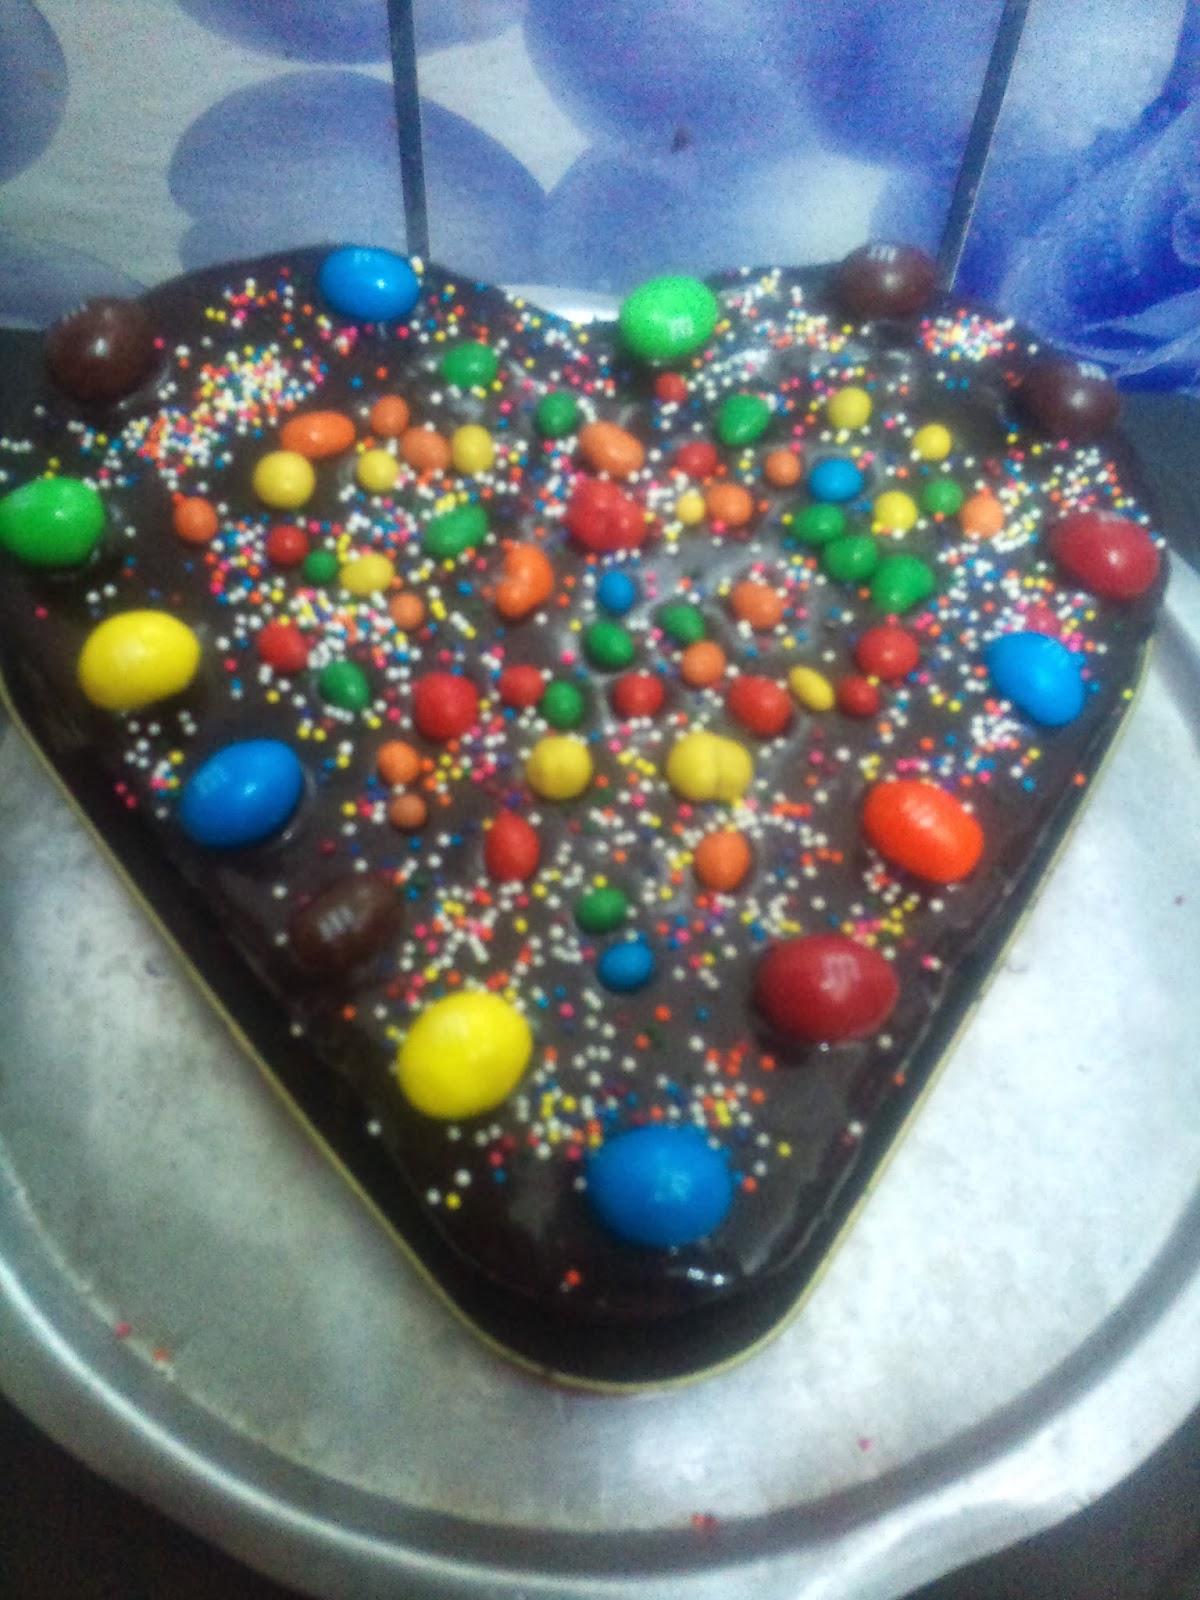 umi qaisara resepi kek coklat kukus mudah  sedap Resepi Kek Guna Gelatin Enak dan Mudah